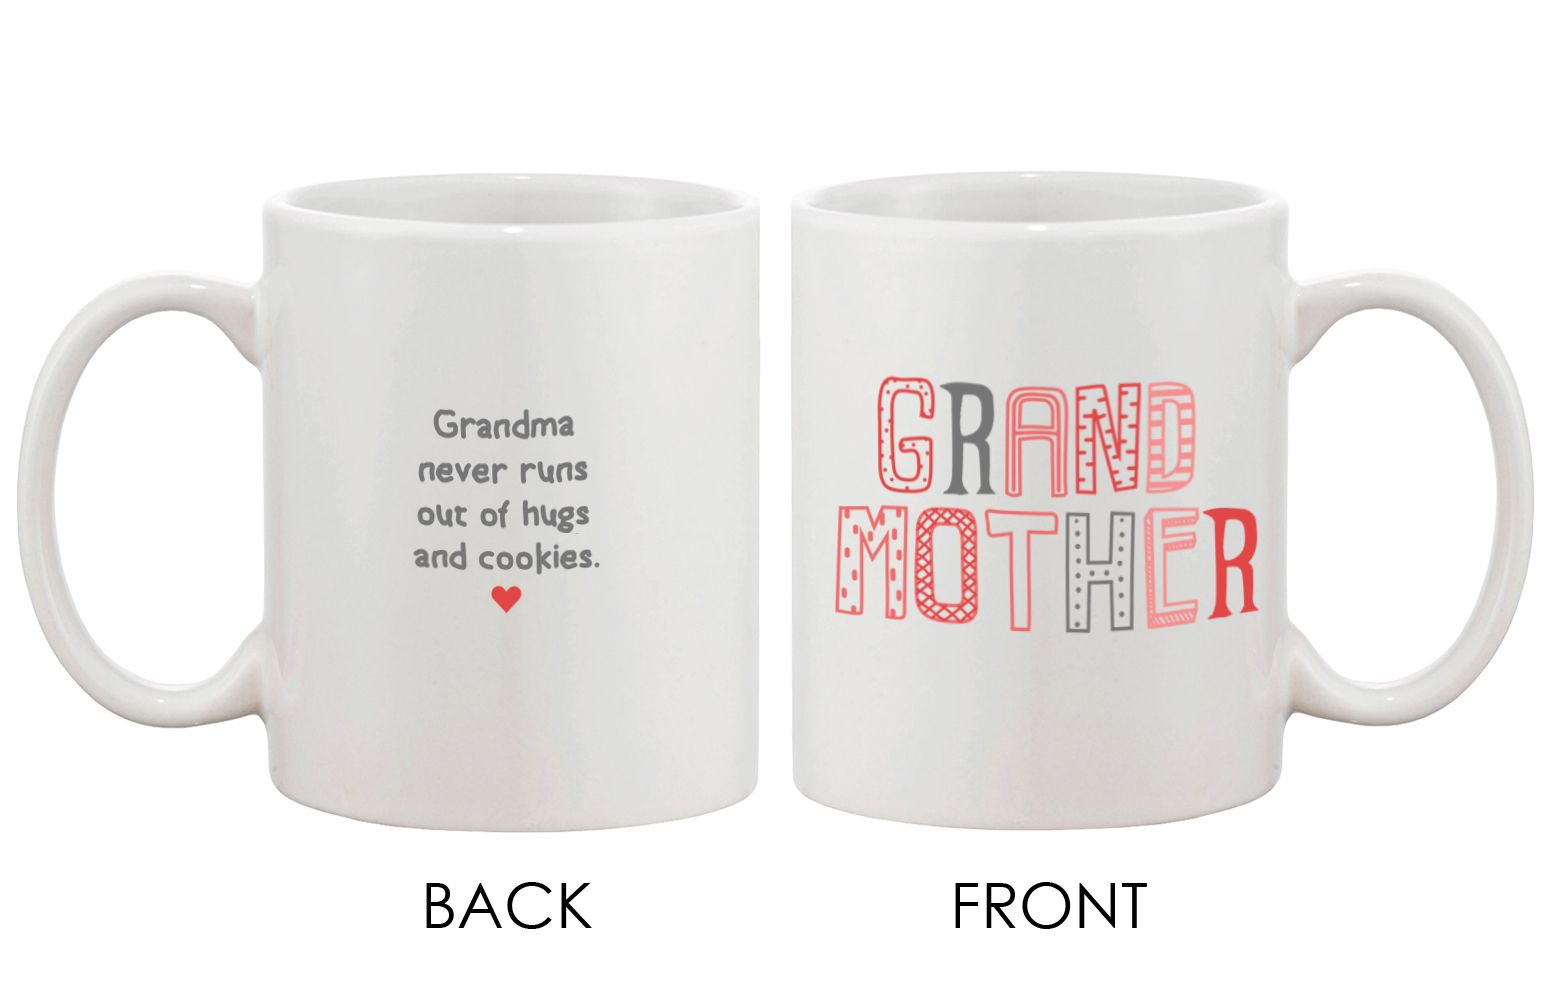 Grandpa and grandma matching mug cups for grandparents day